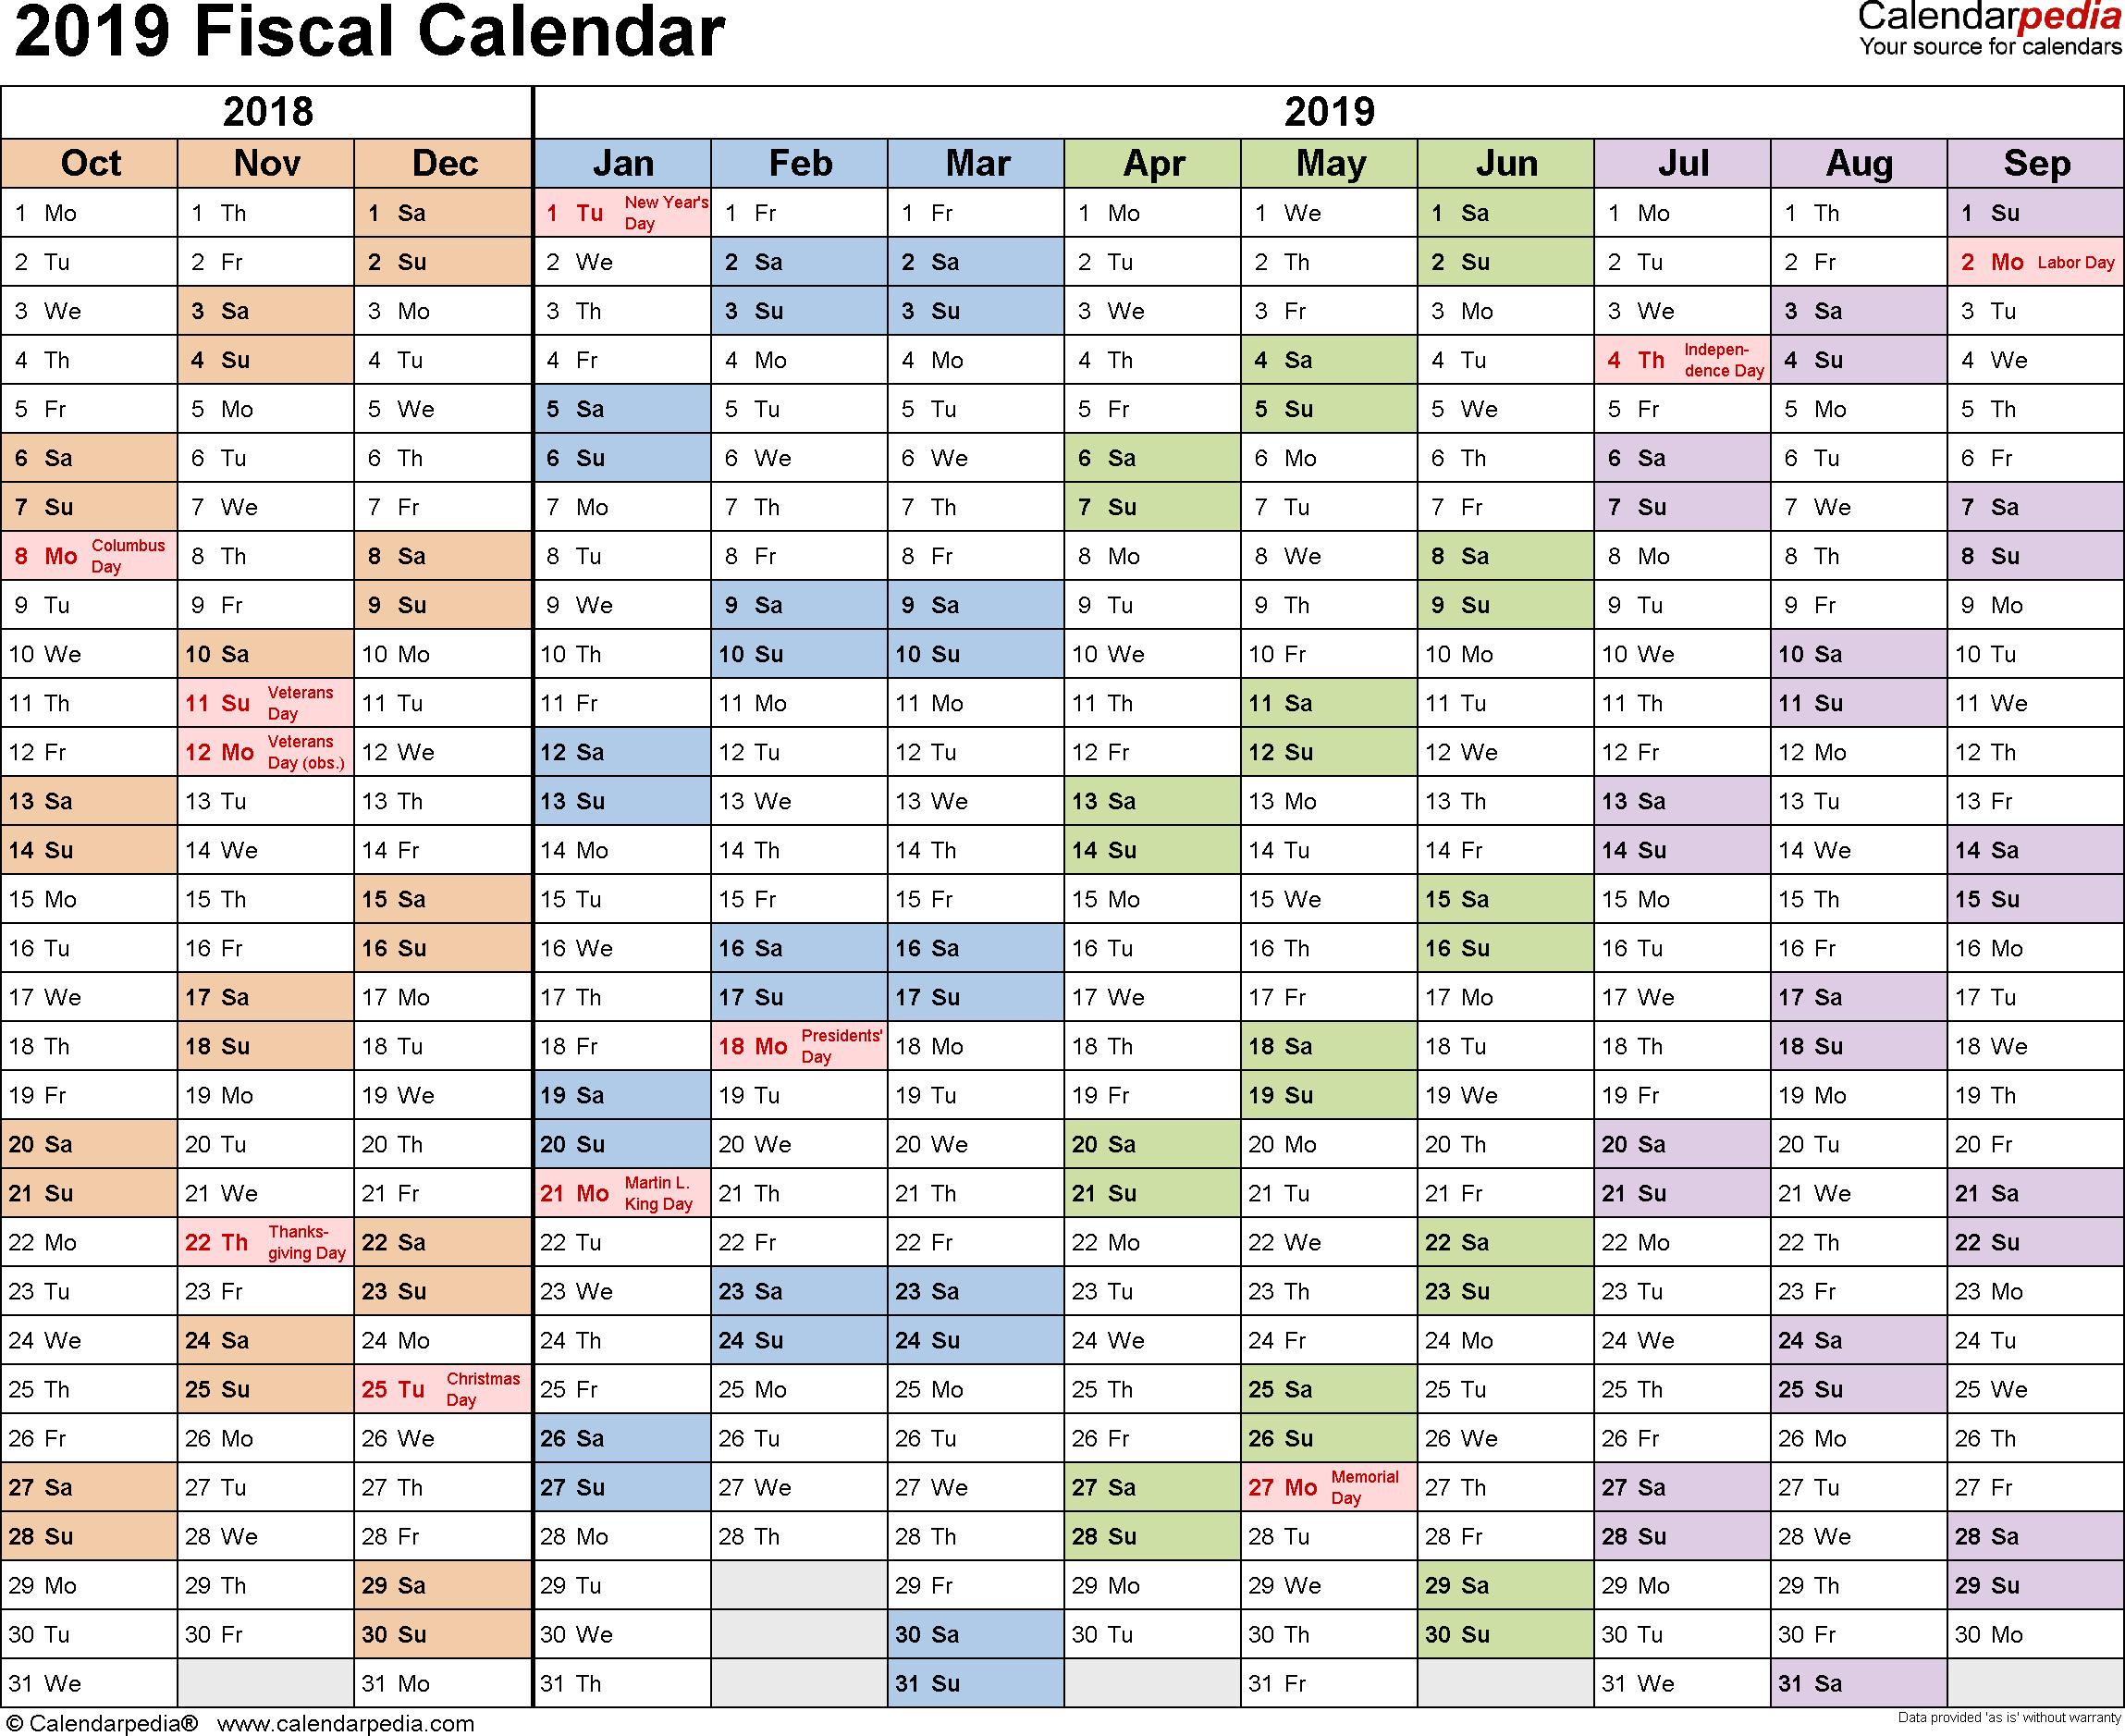 Fiscal Calendars 2019 As Free Printable Pdf Templates inside 2019-2020 Calendar Financial Week Numbers